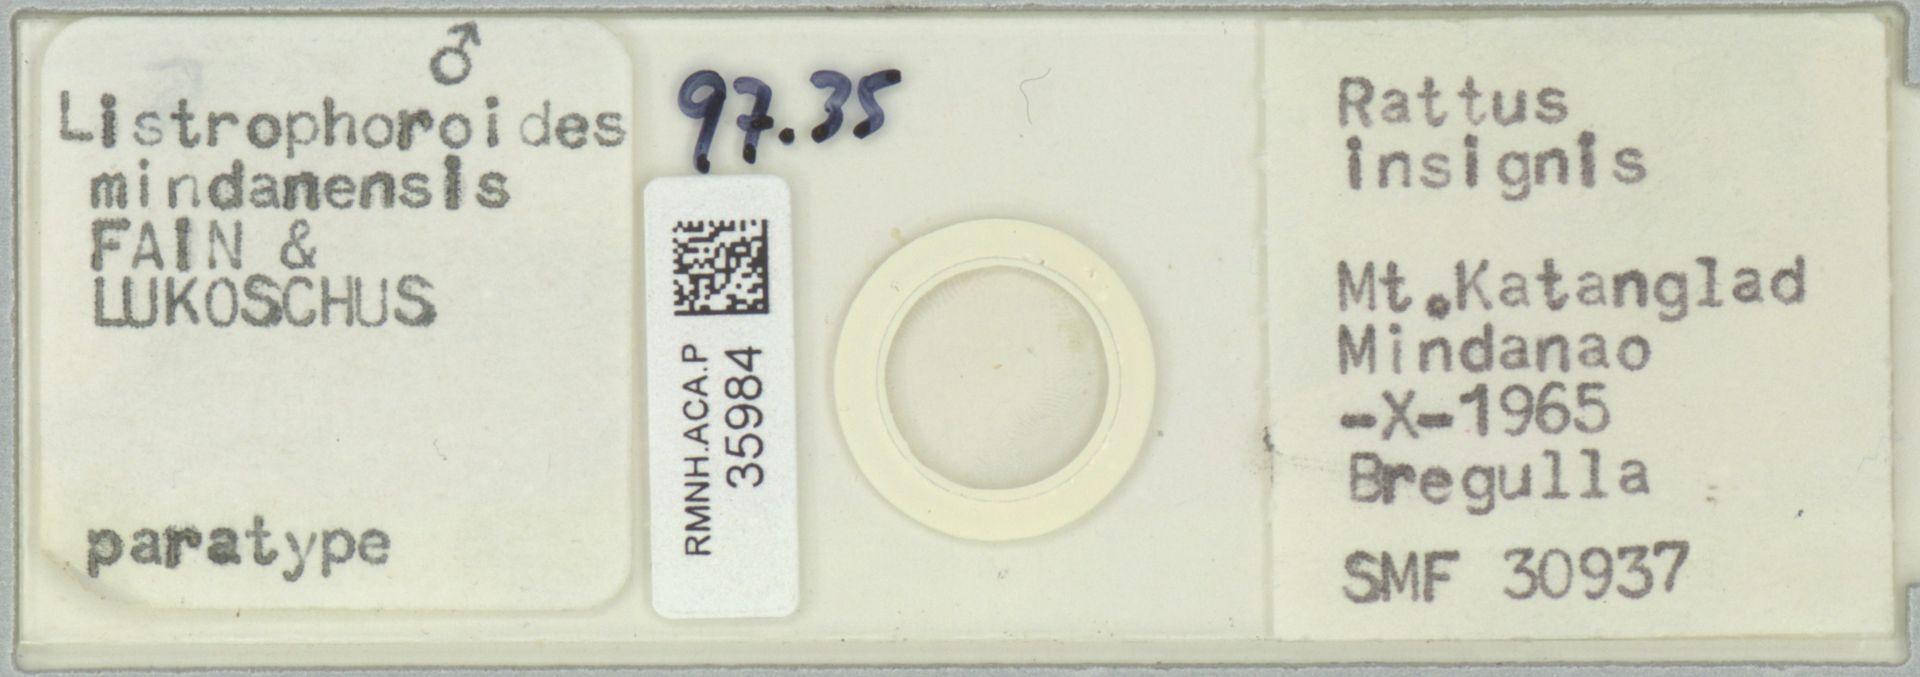 RMNH.ACA.P.35984 | Listrophoroides mindanensis Fain & Lukoschus